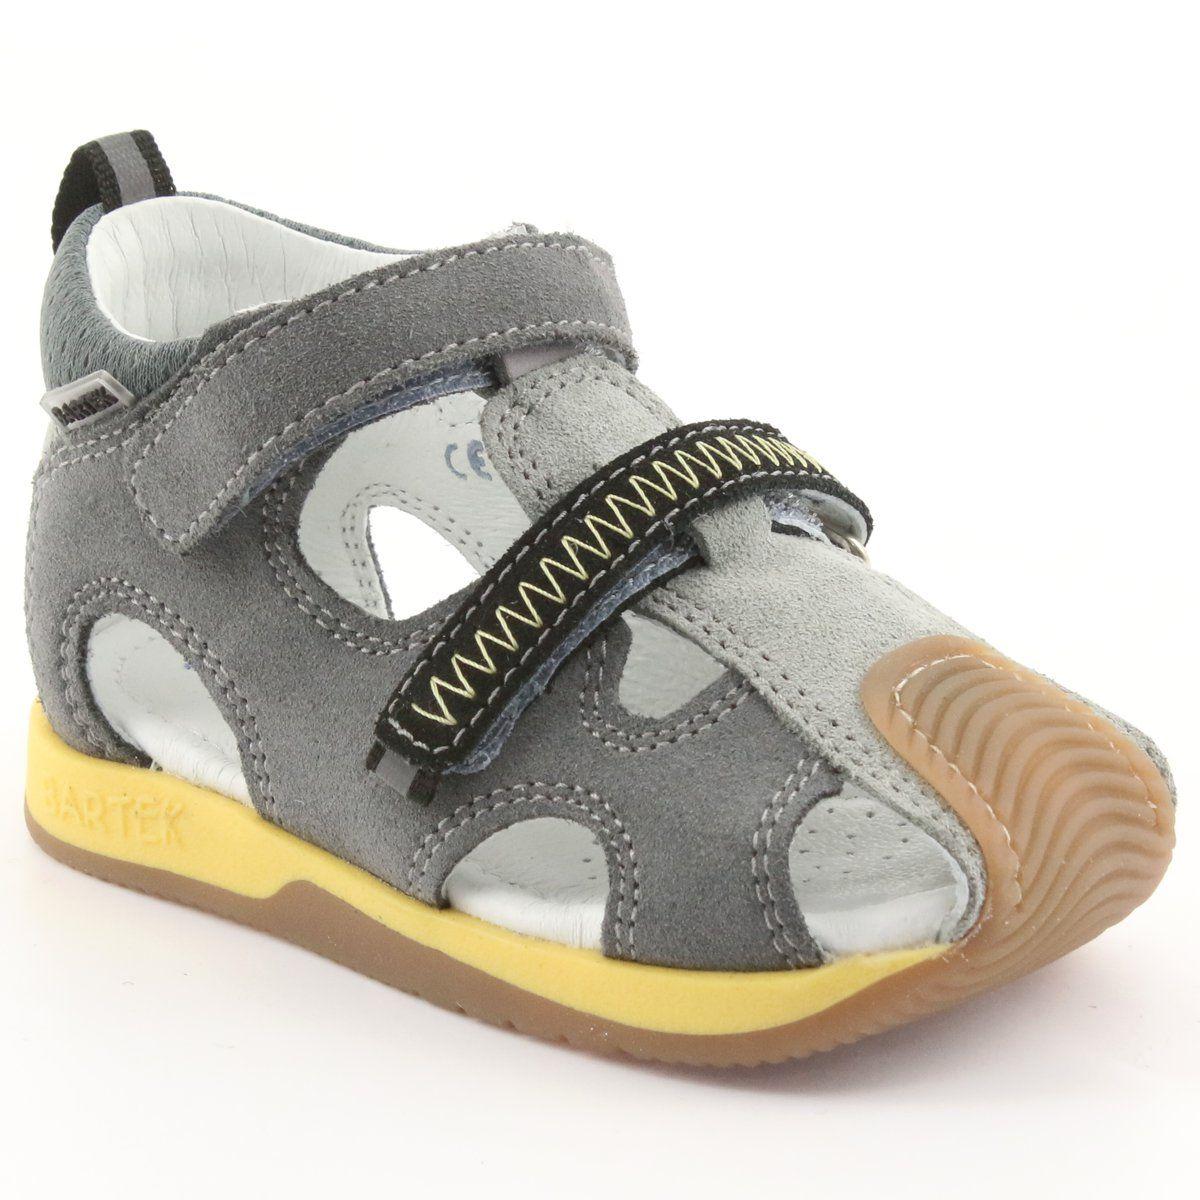 Sandalki Chlopiece Rzepy Bartek 81772 Szare Zolte Baby Shoes Footwear Shoes